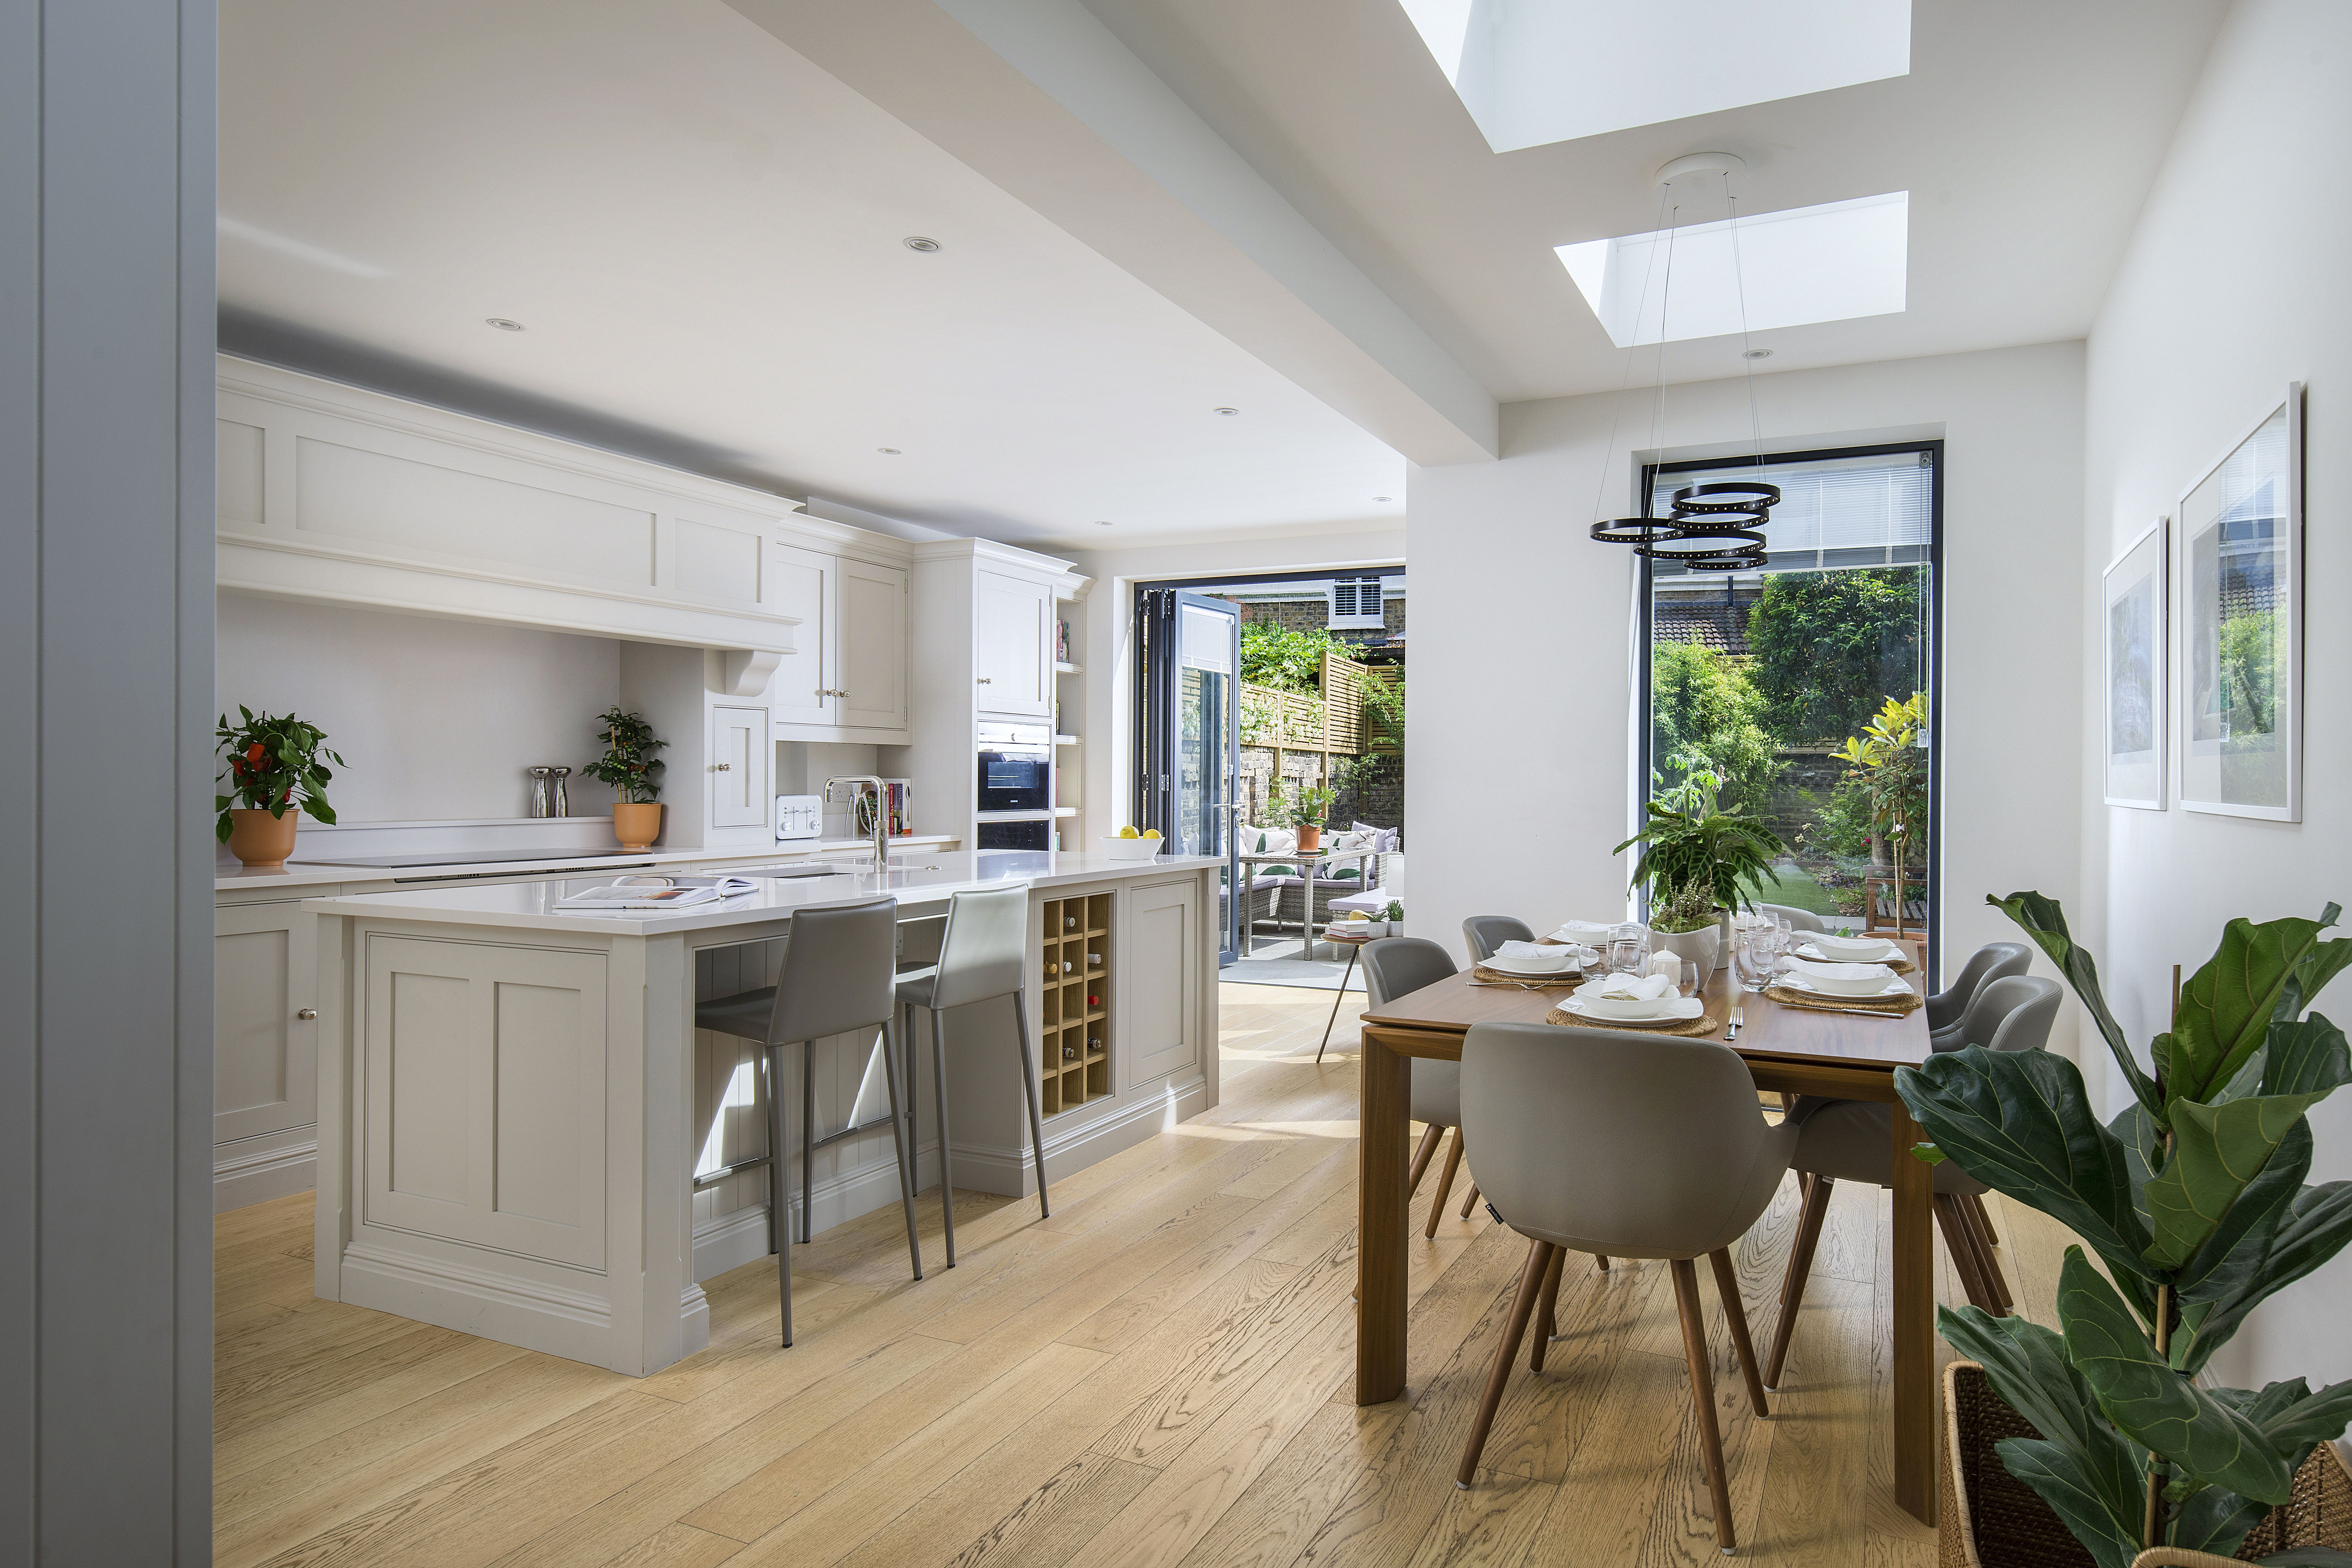 Tom Howley Kitchen Kitchen Design Tom Howley Kitchens Luxury Kitchens